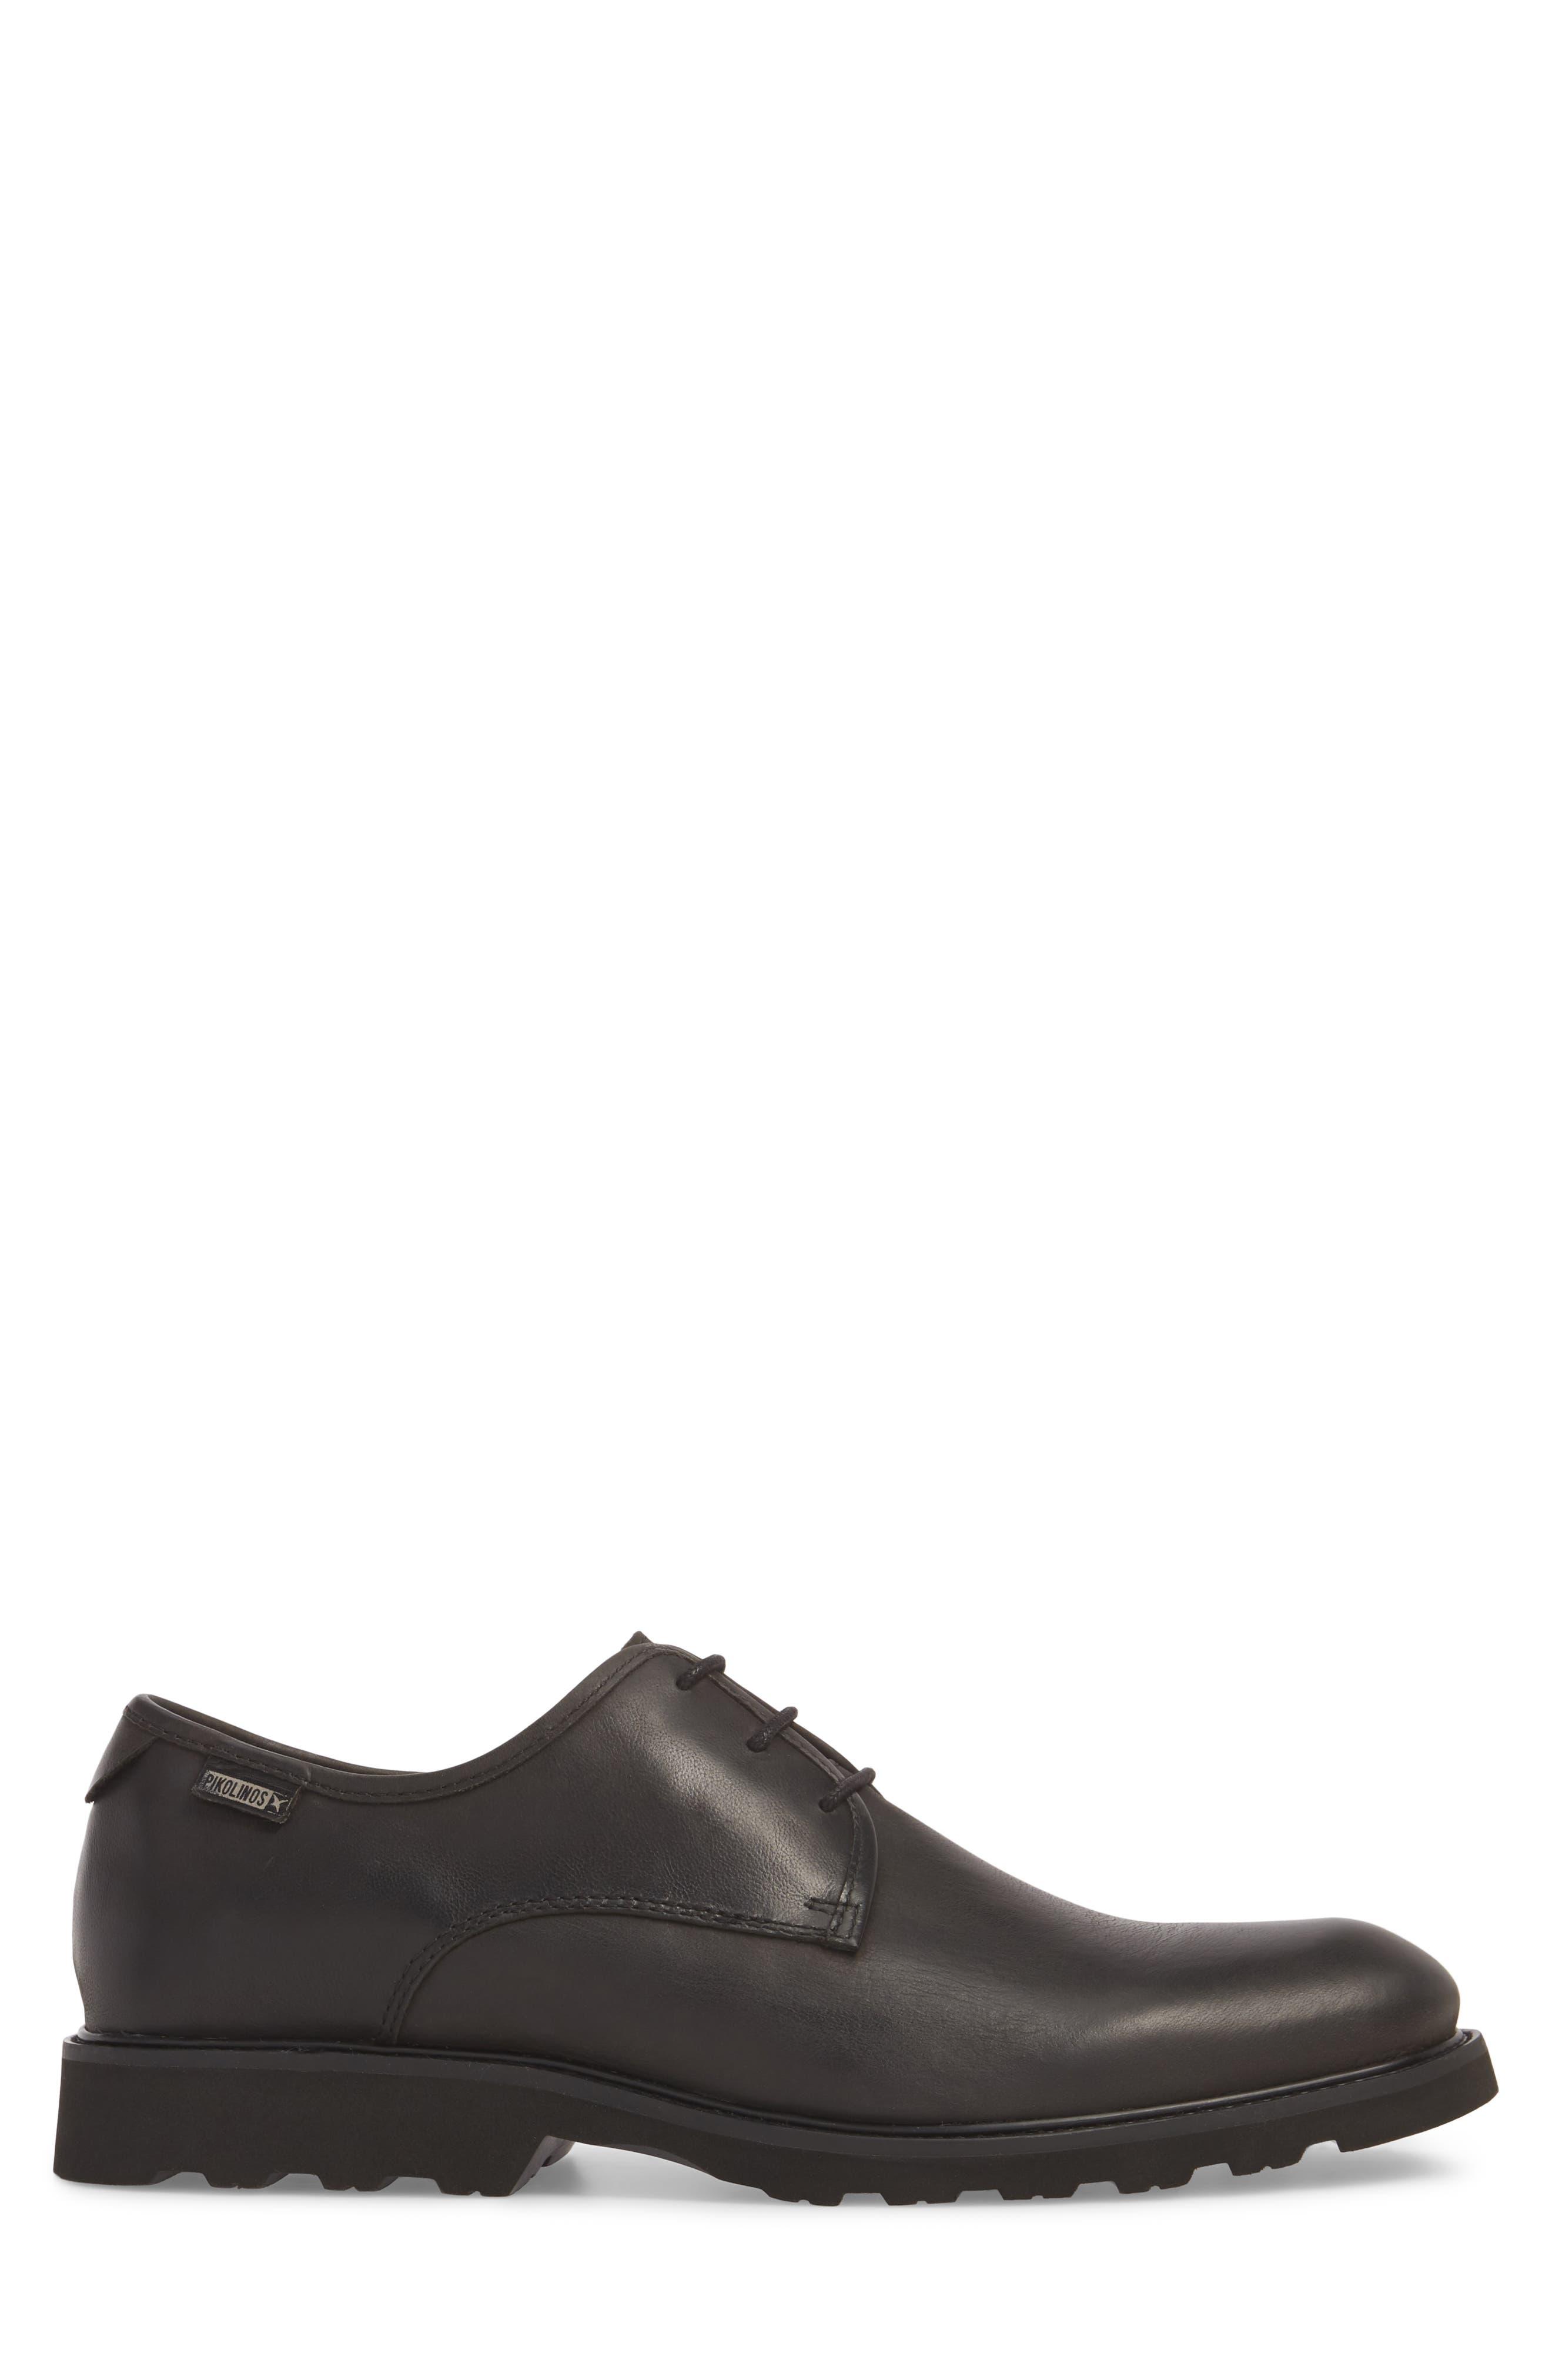 'Glasgow' Derby,                             Alternate thumbnail 3, color,                             Black Leather